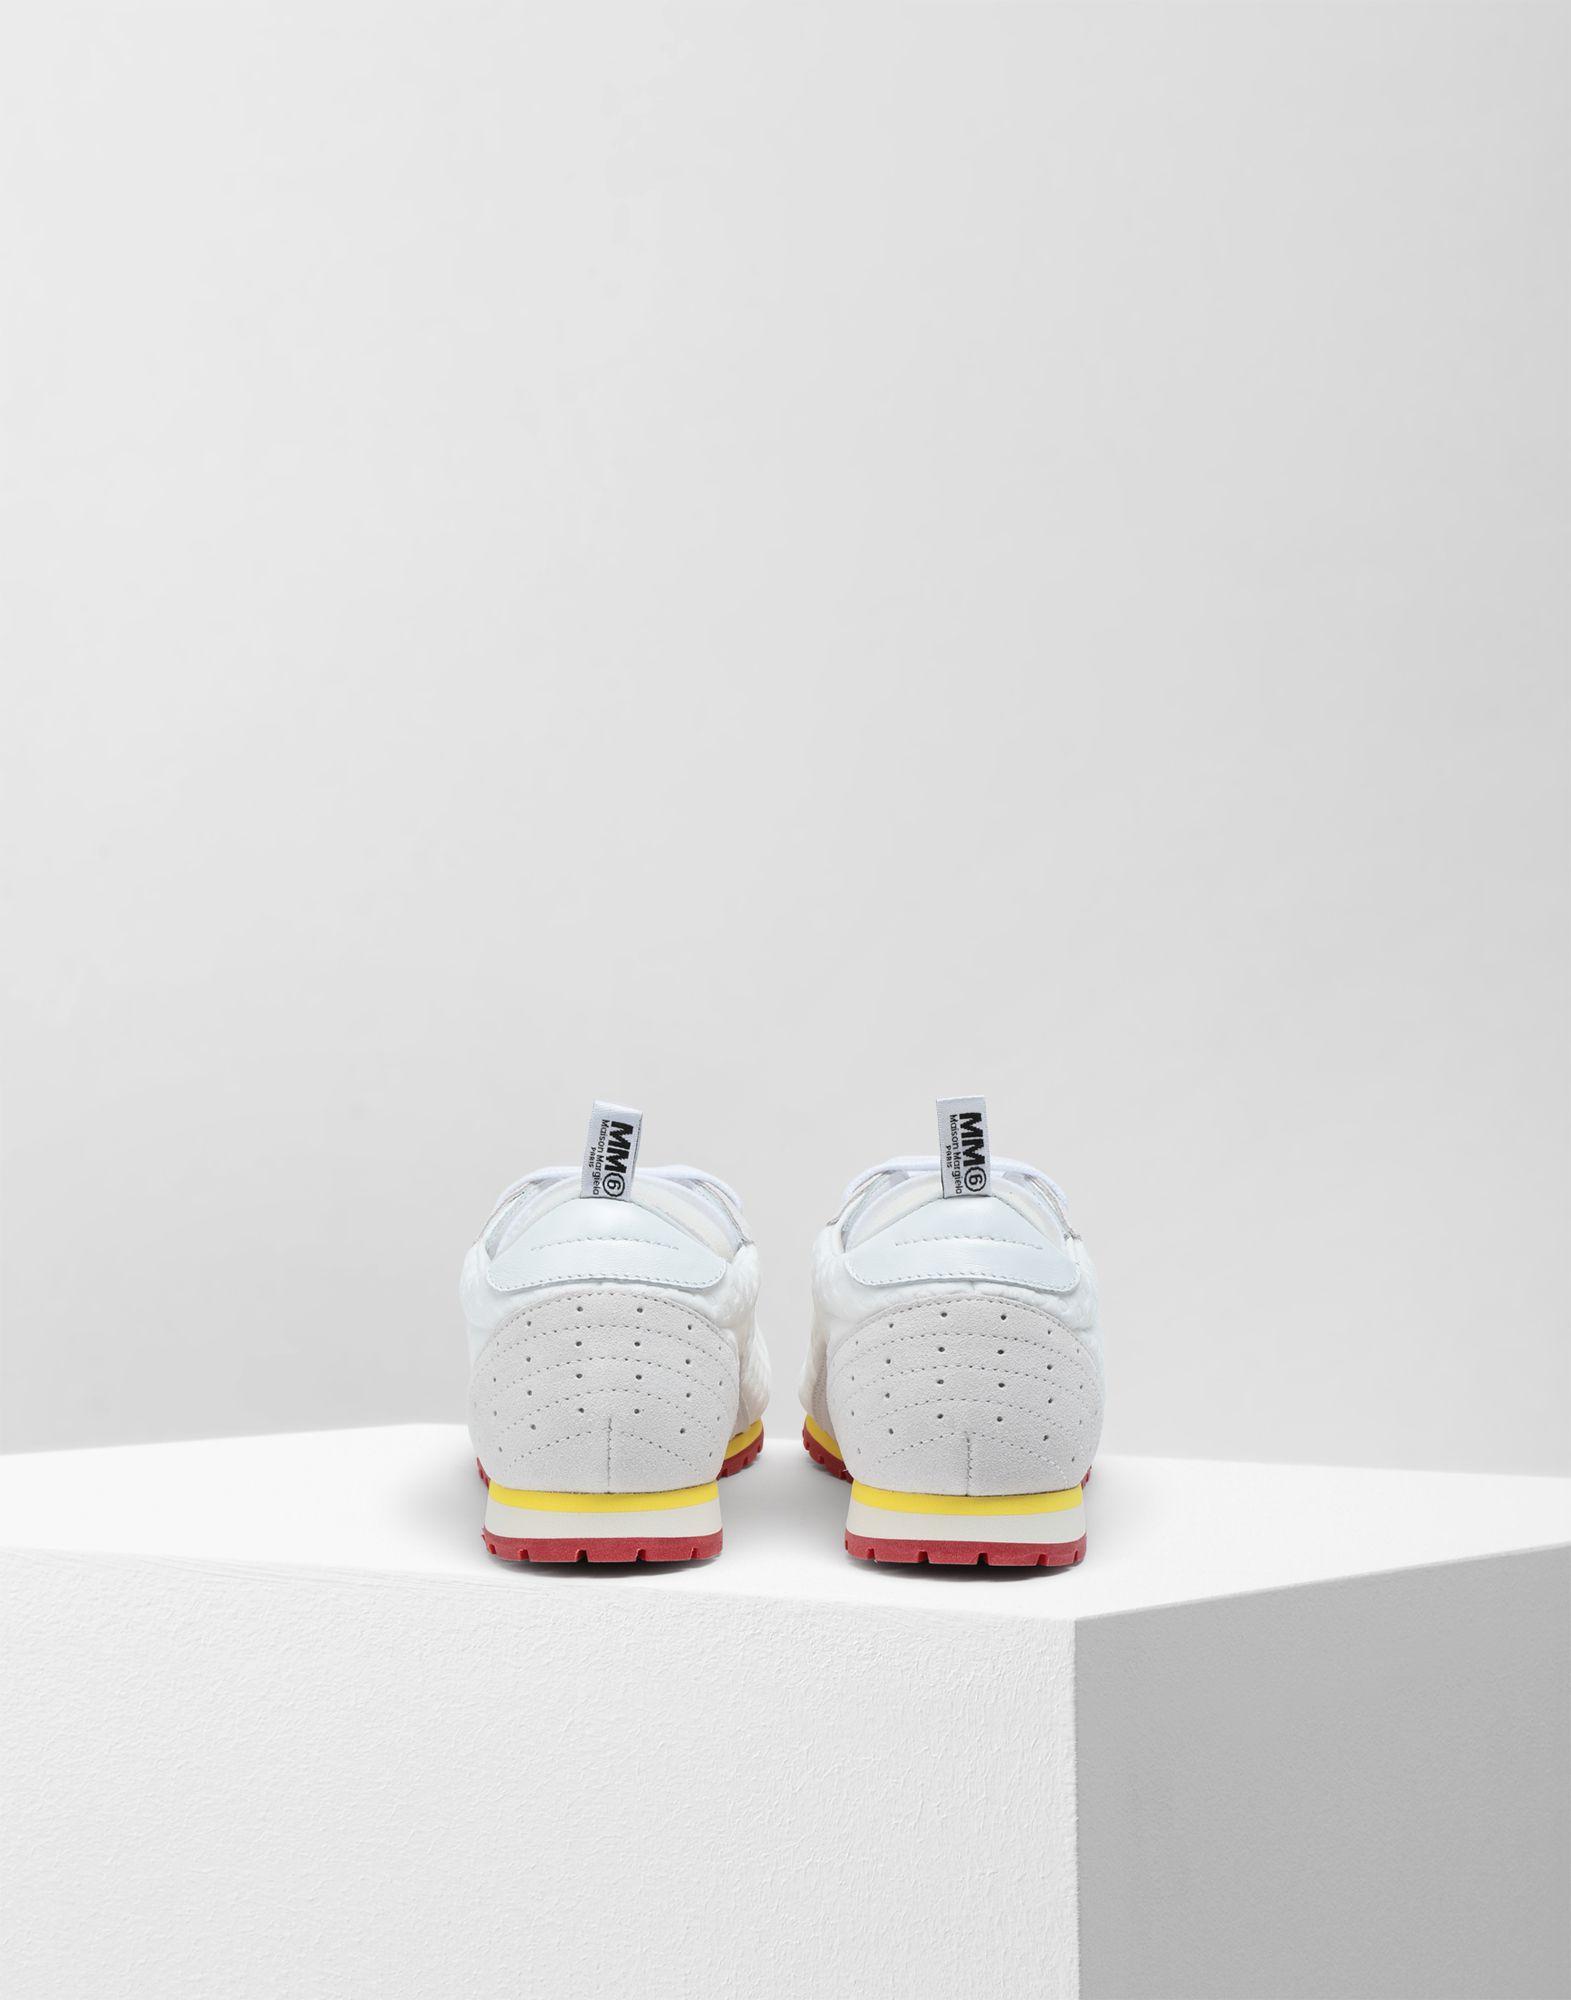 MM6 MAISON MARGIELA Pull-tab sneakers Sneakers Woman e